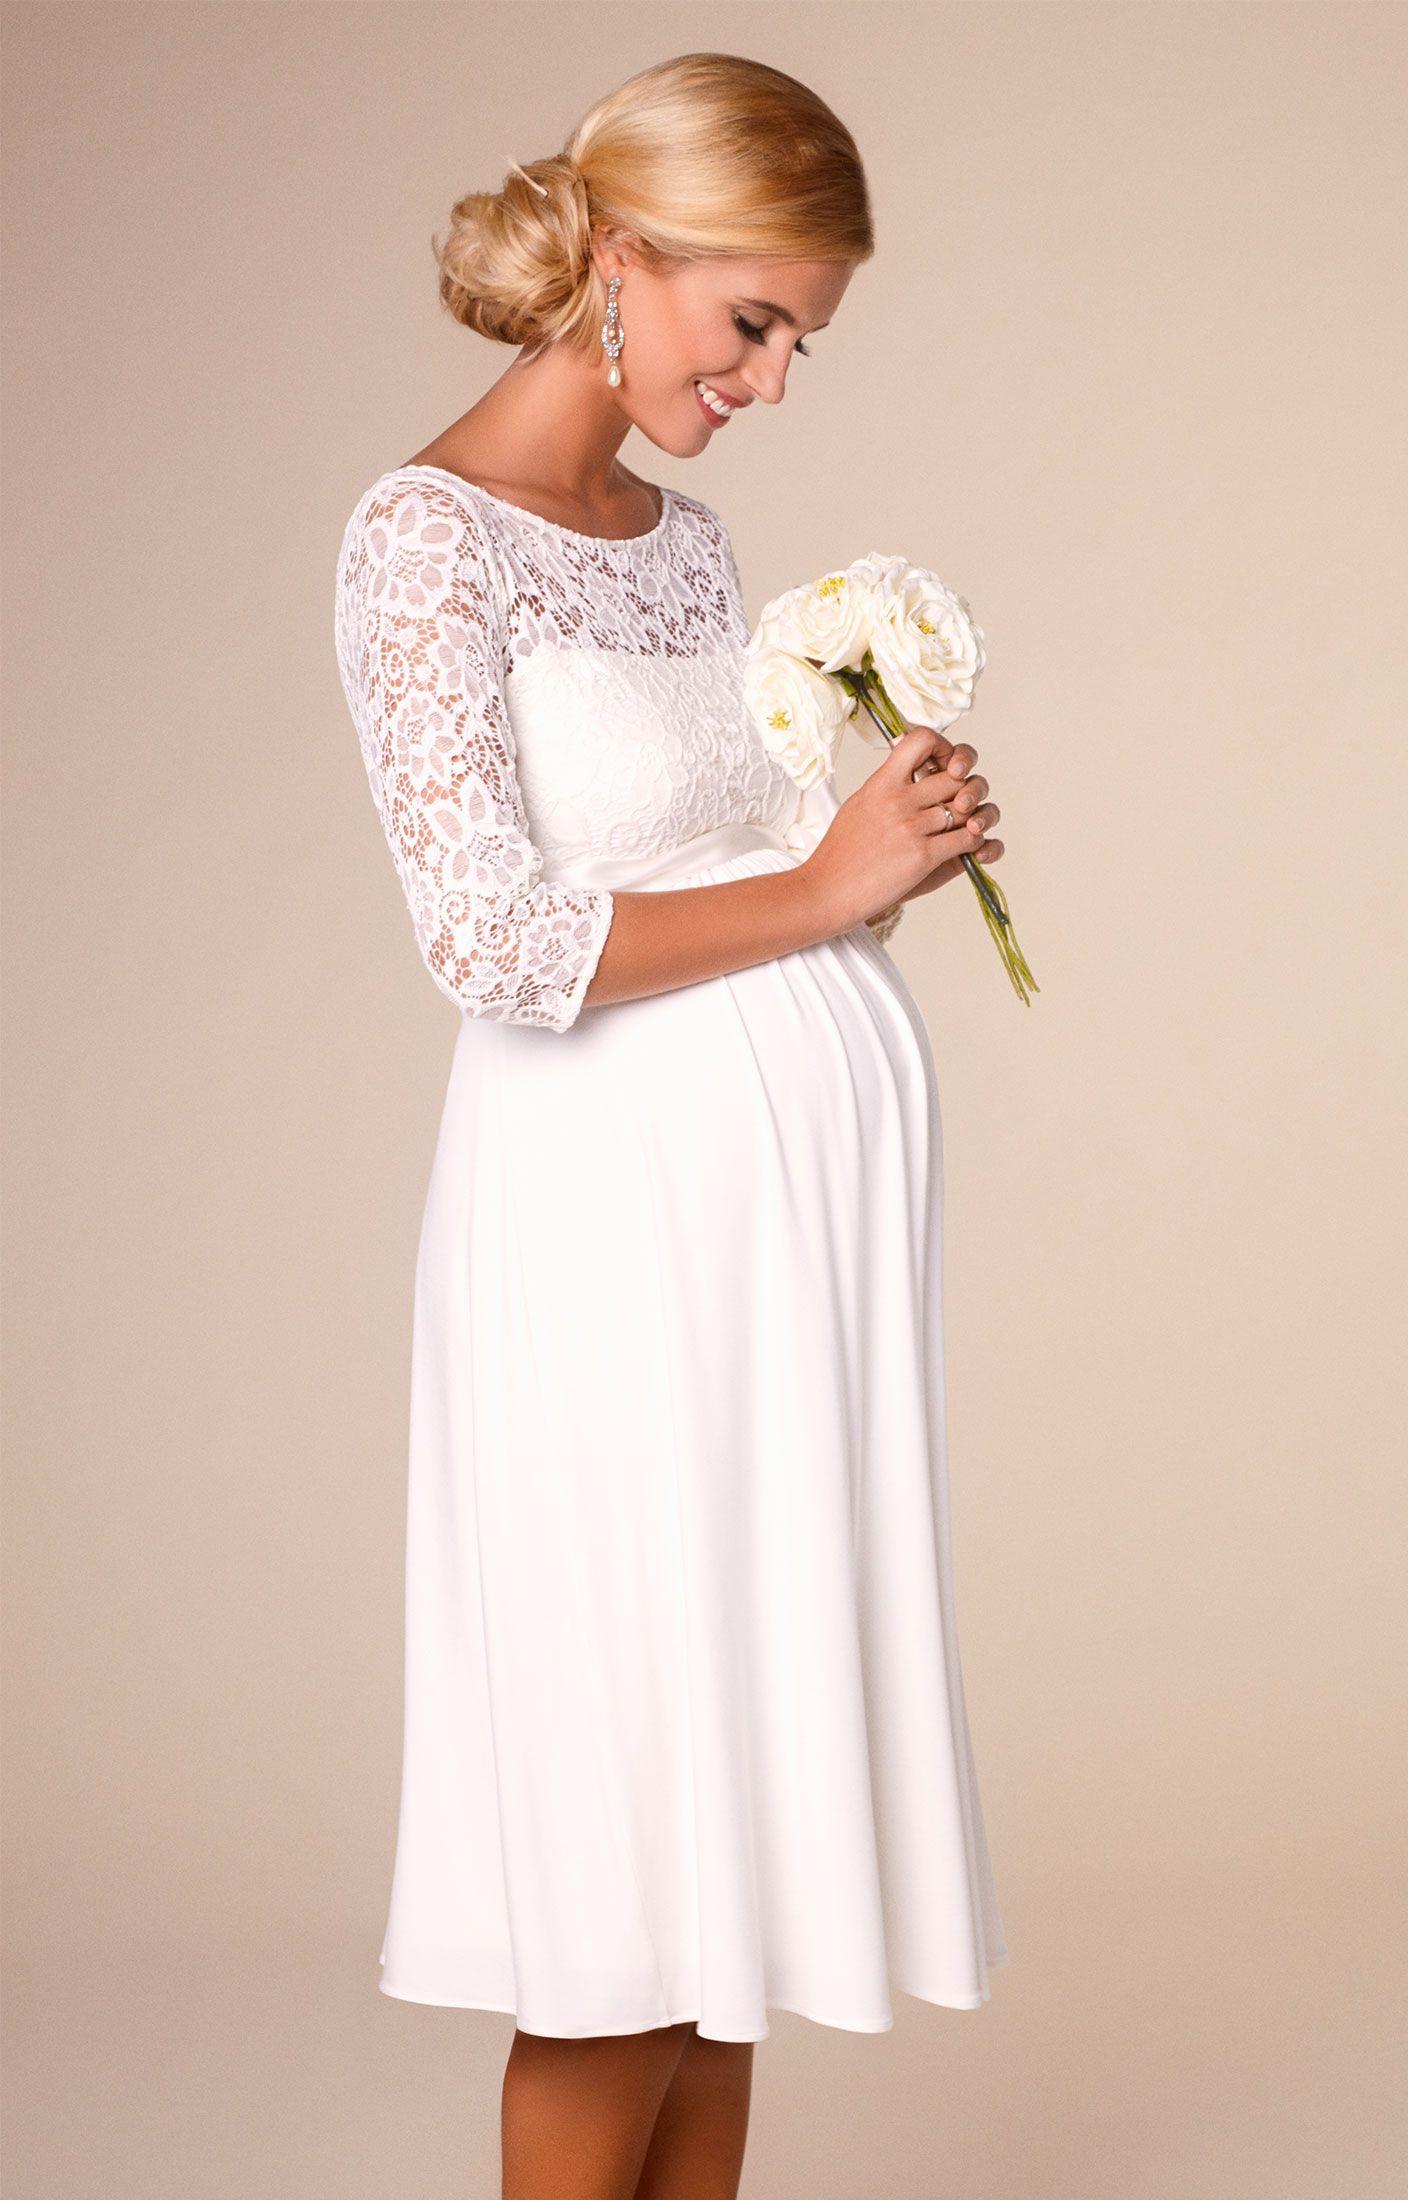 Short maternity wedding dresses  Lucia Klänning Kort  Wedding  Pinterest  Wedding dresses